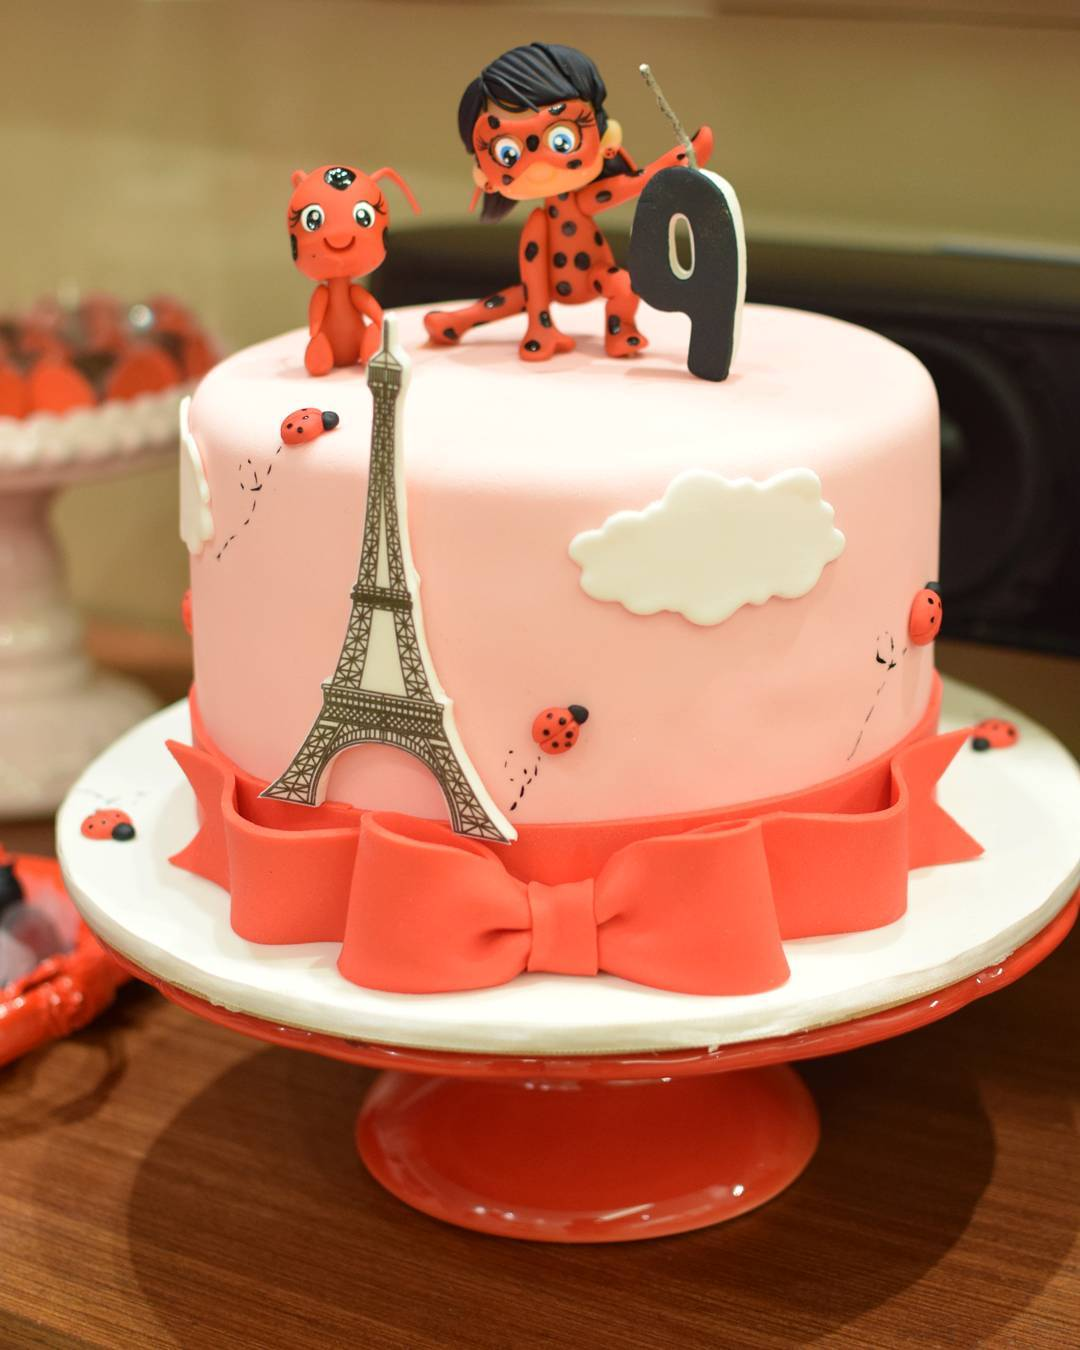 festa infantil miraculous ladybug   15 decora es de arrasar